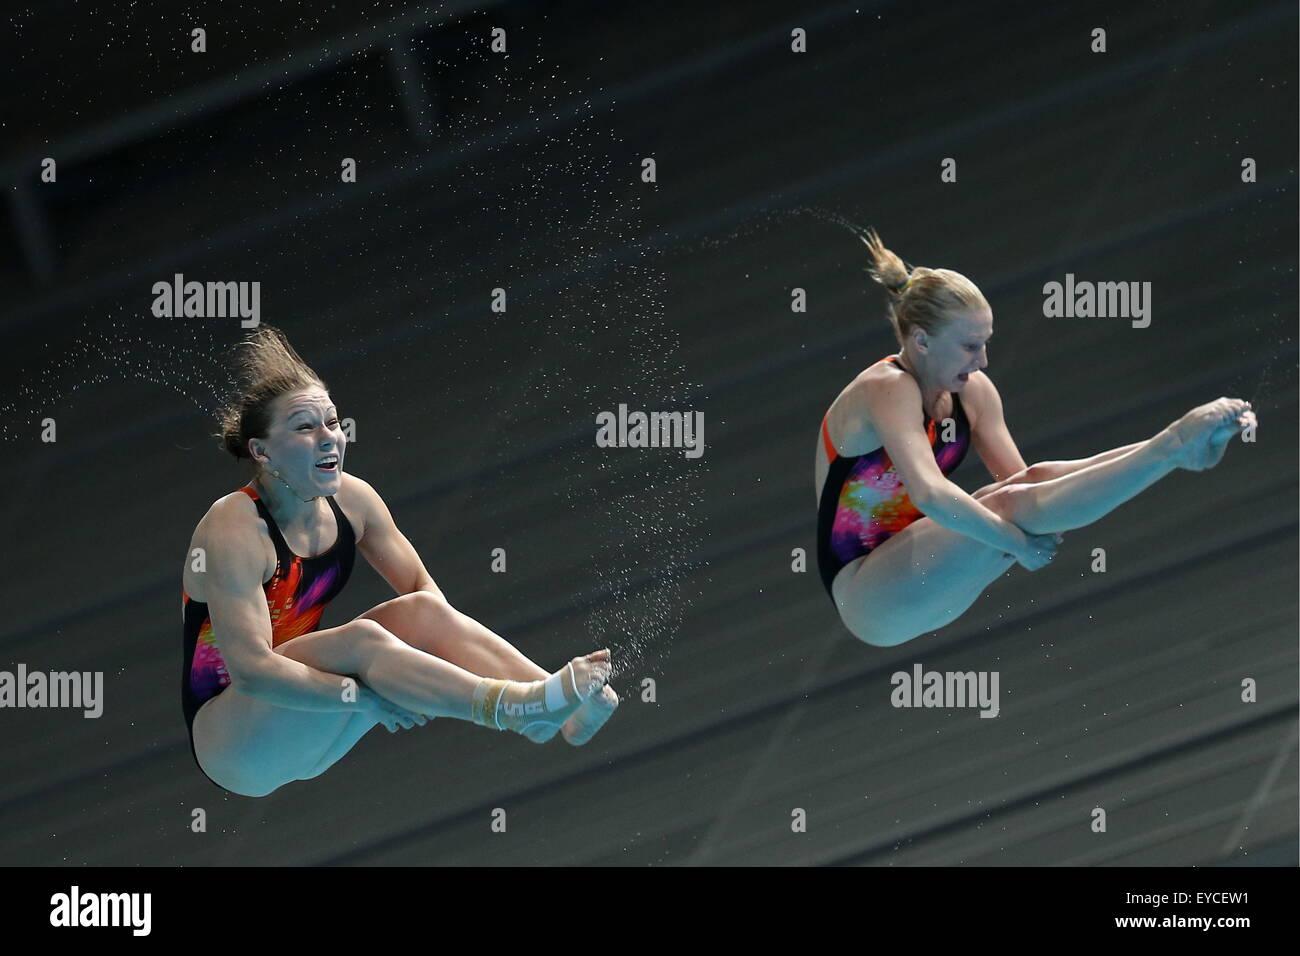 KAZAN, RUSSIA. JULY 25, 2015. Ukraine's Anastasia Nedobiga and Victoriya Kesar compete in the women's synchronized - Stock Image